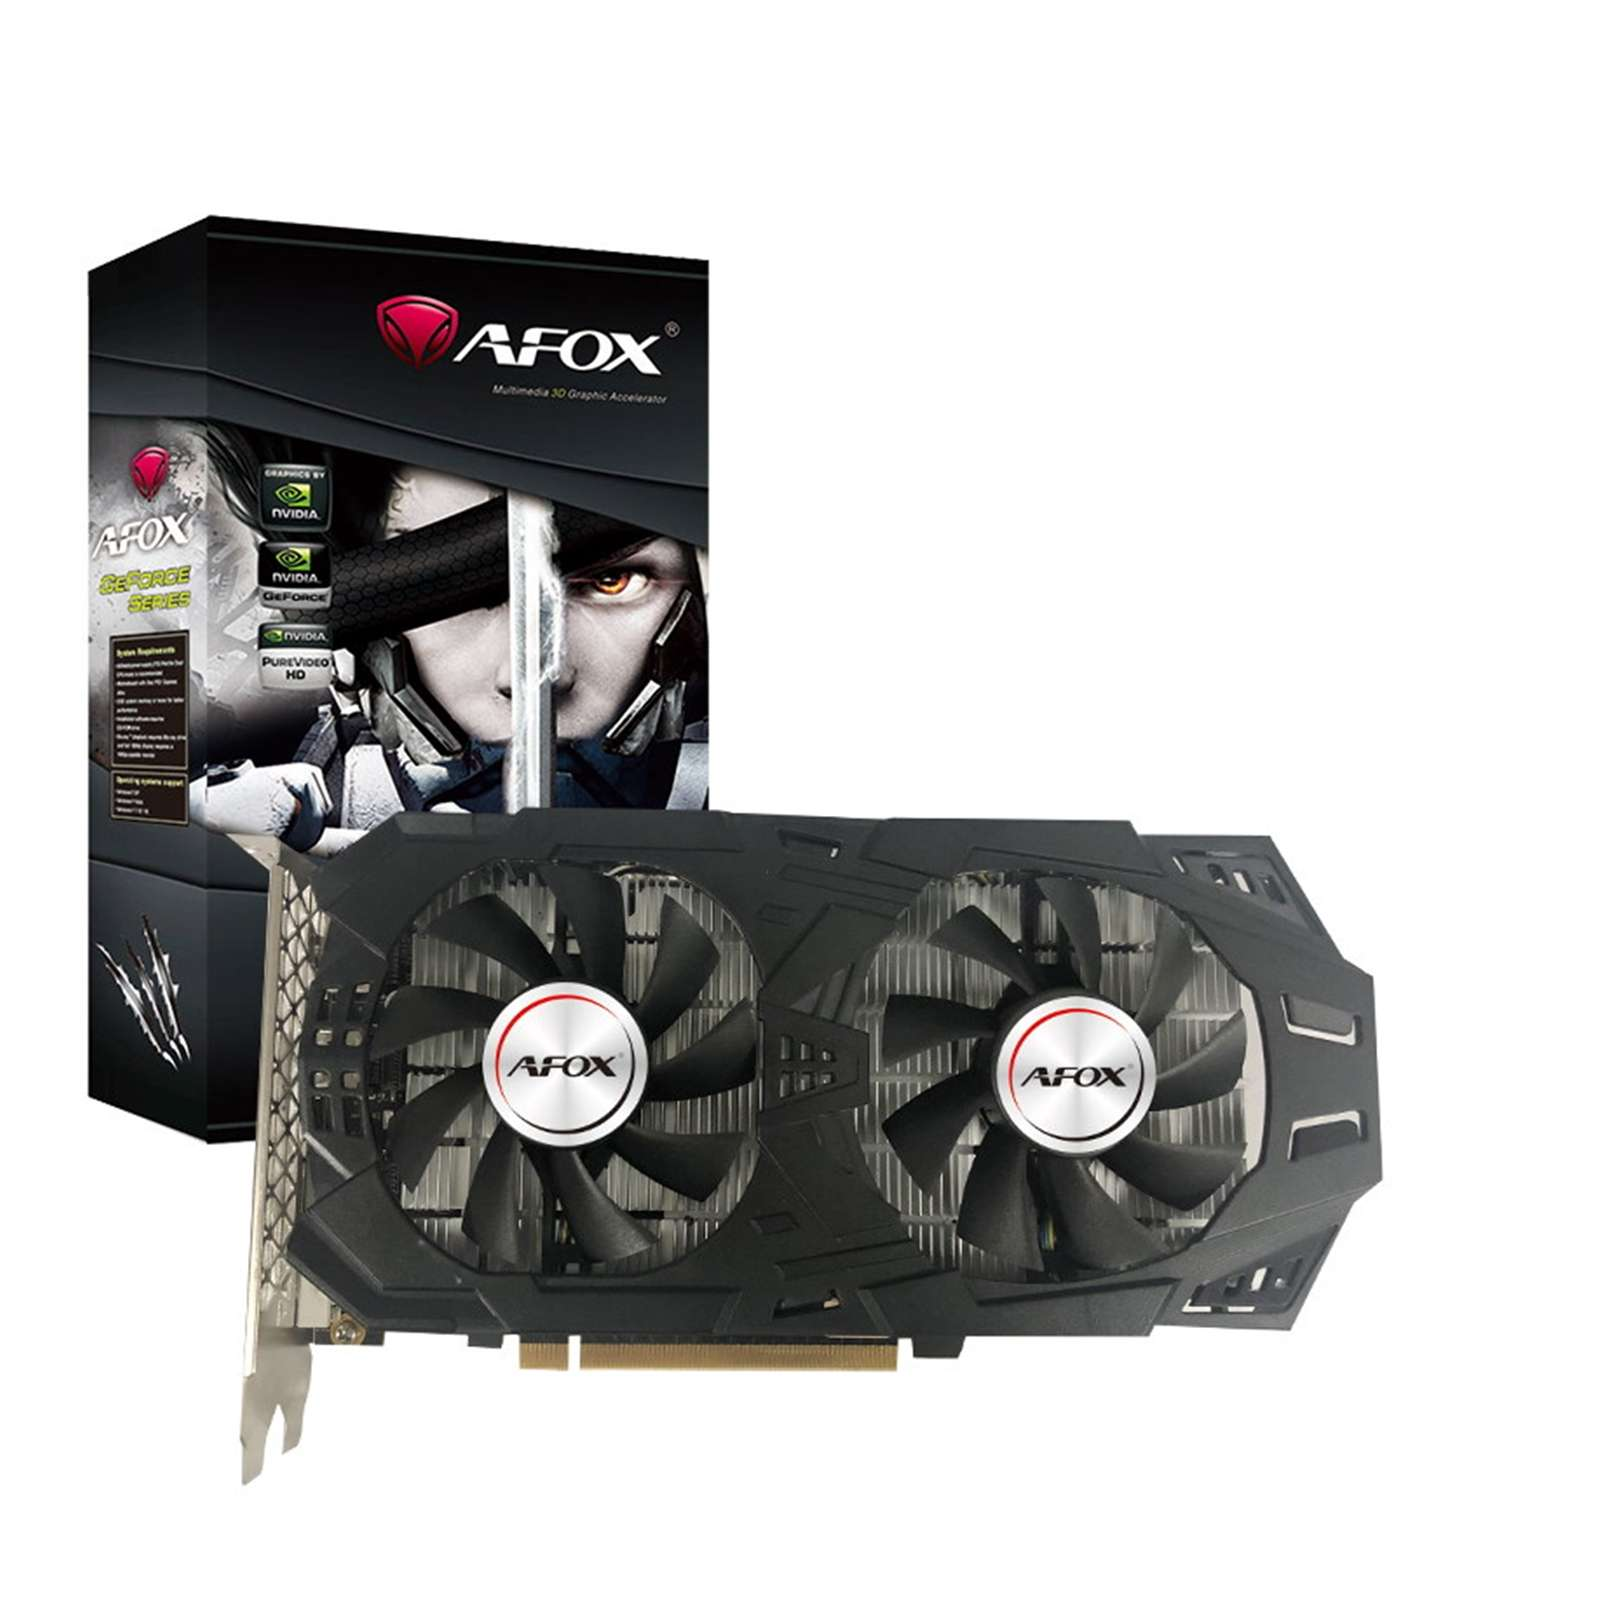 AFOX Nvidia GeForce GTX1060 3GB GDDR5 Dual Fan Graphics Card